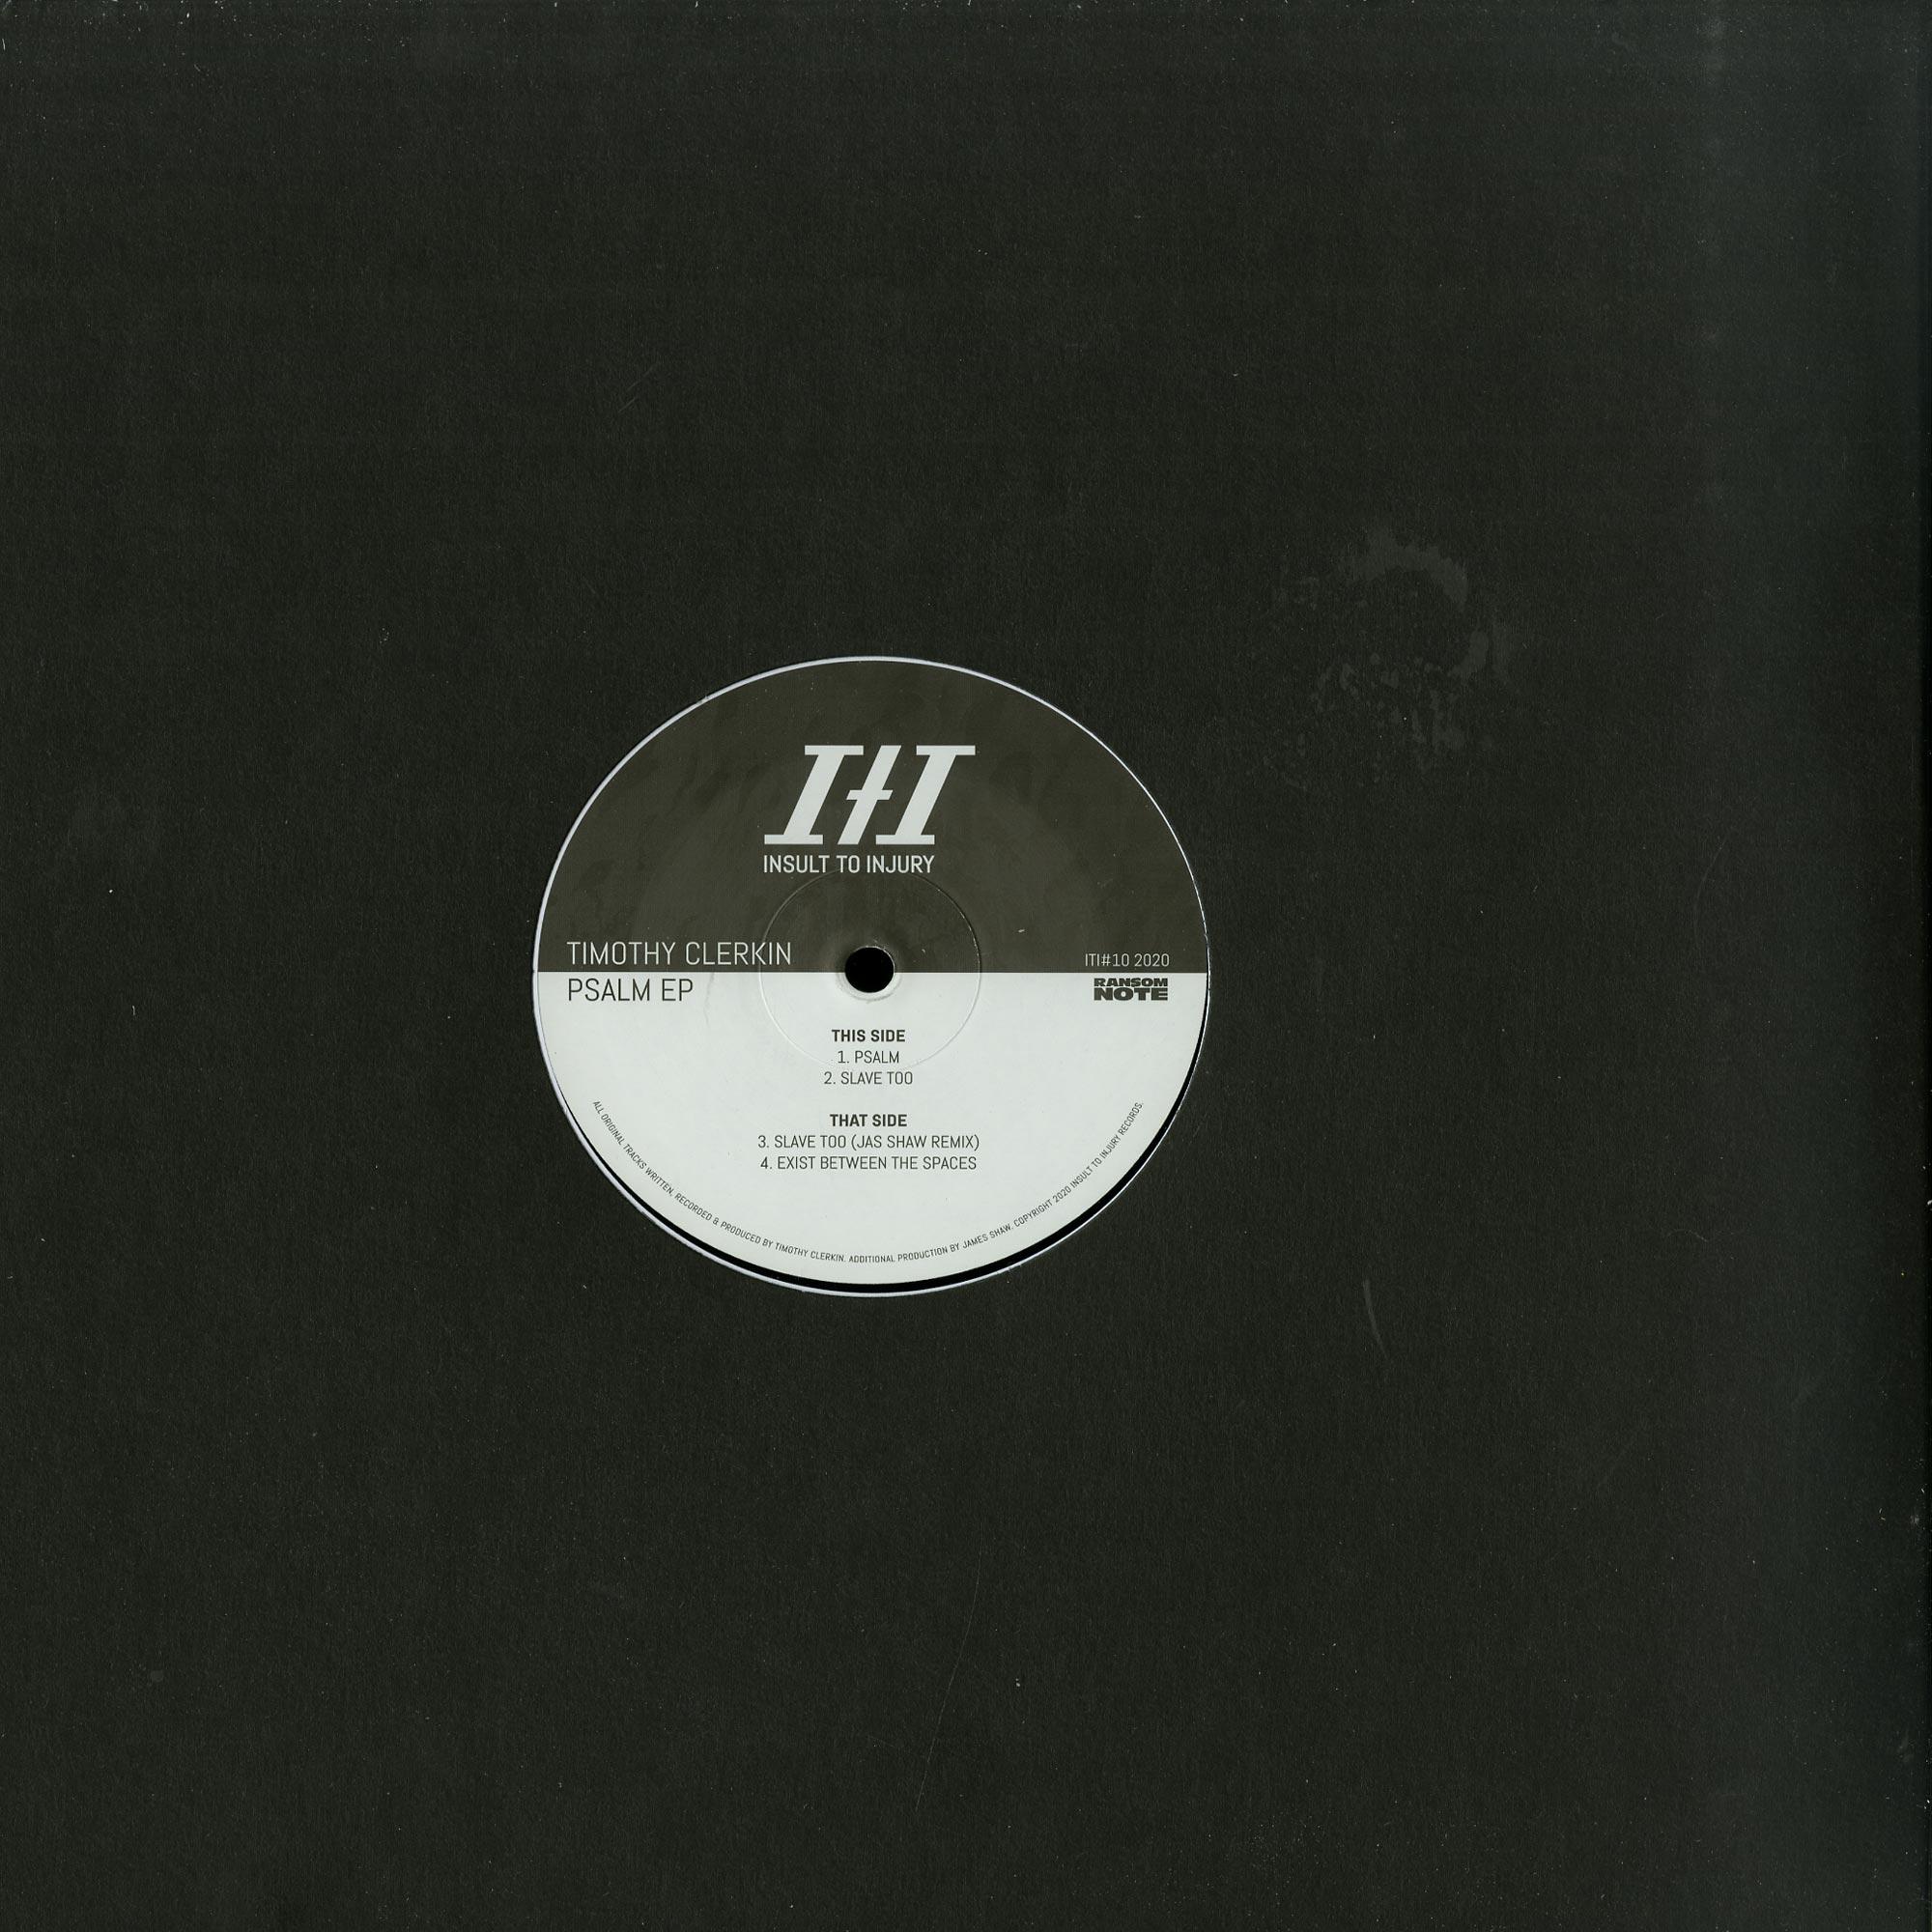 Timothy Clerkin - PSALM EP